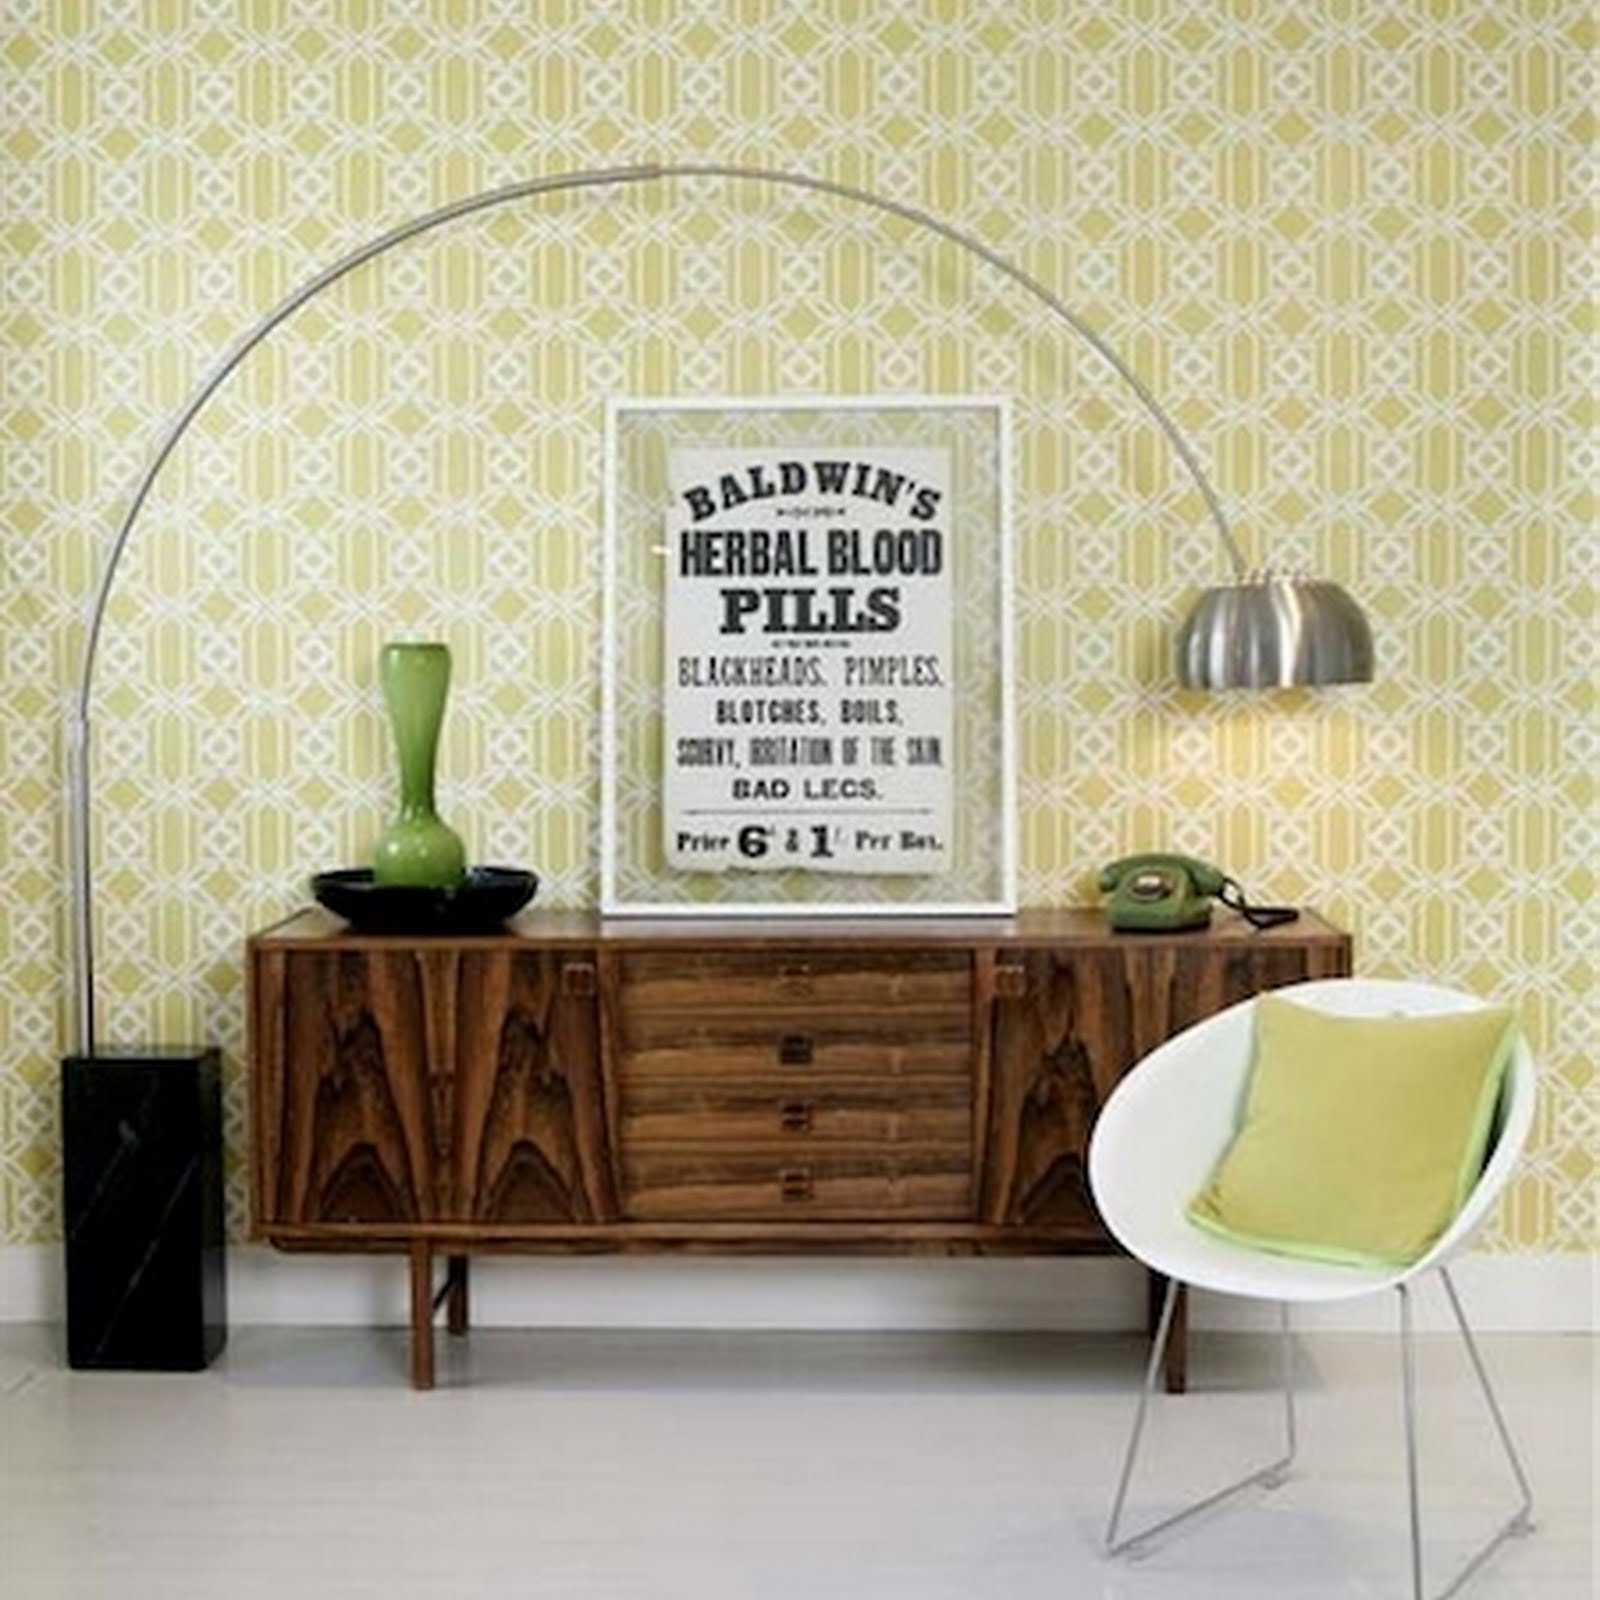 jolijn retro interieur. Black Bedroom Furniture Sets. Home Design Ideas